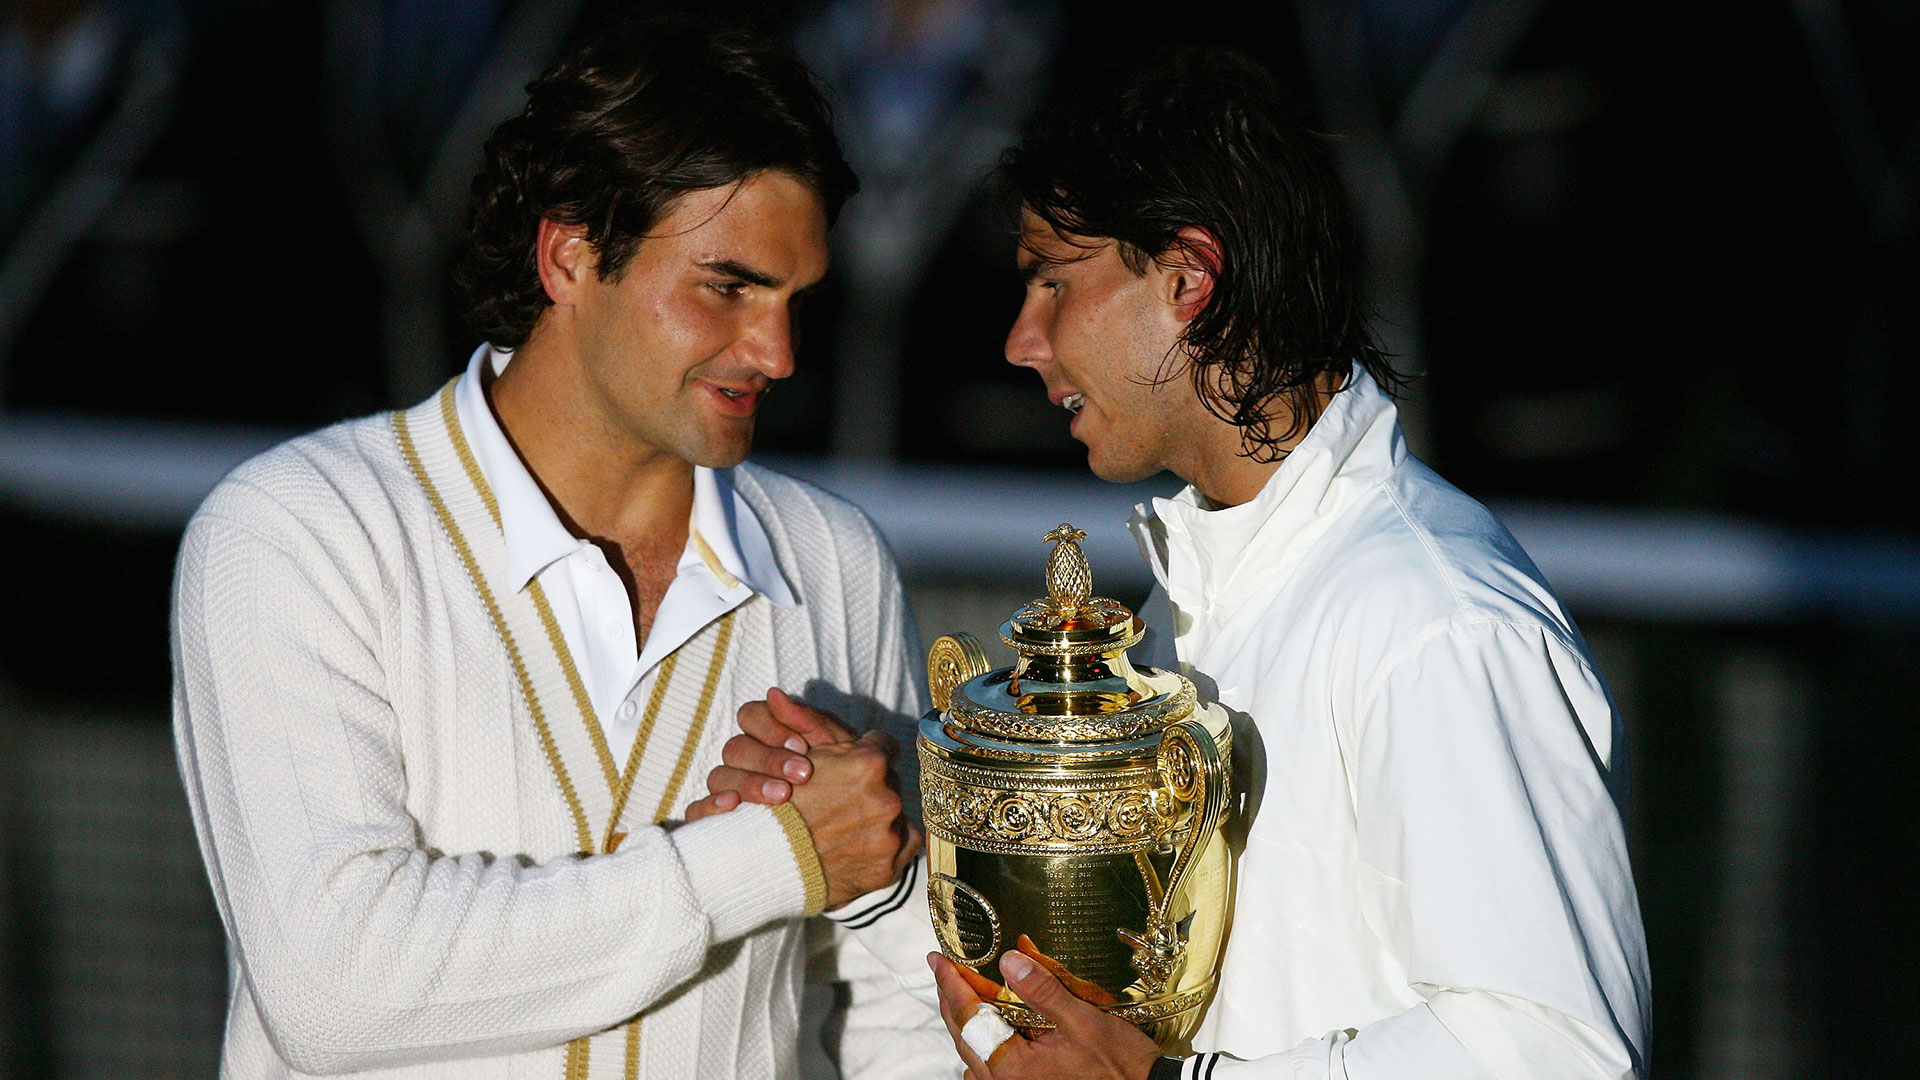 Real Madrid keen to host Federer-Nadal blockbuster at the Bernabeu